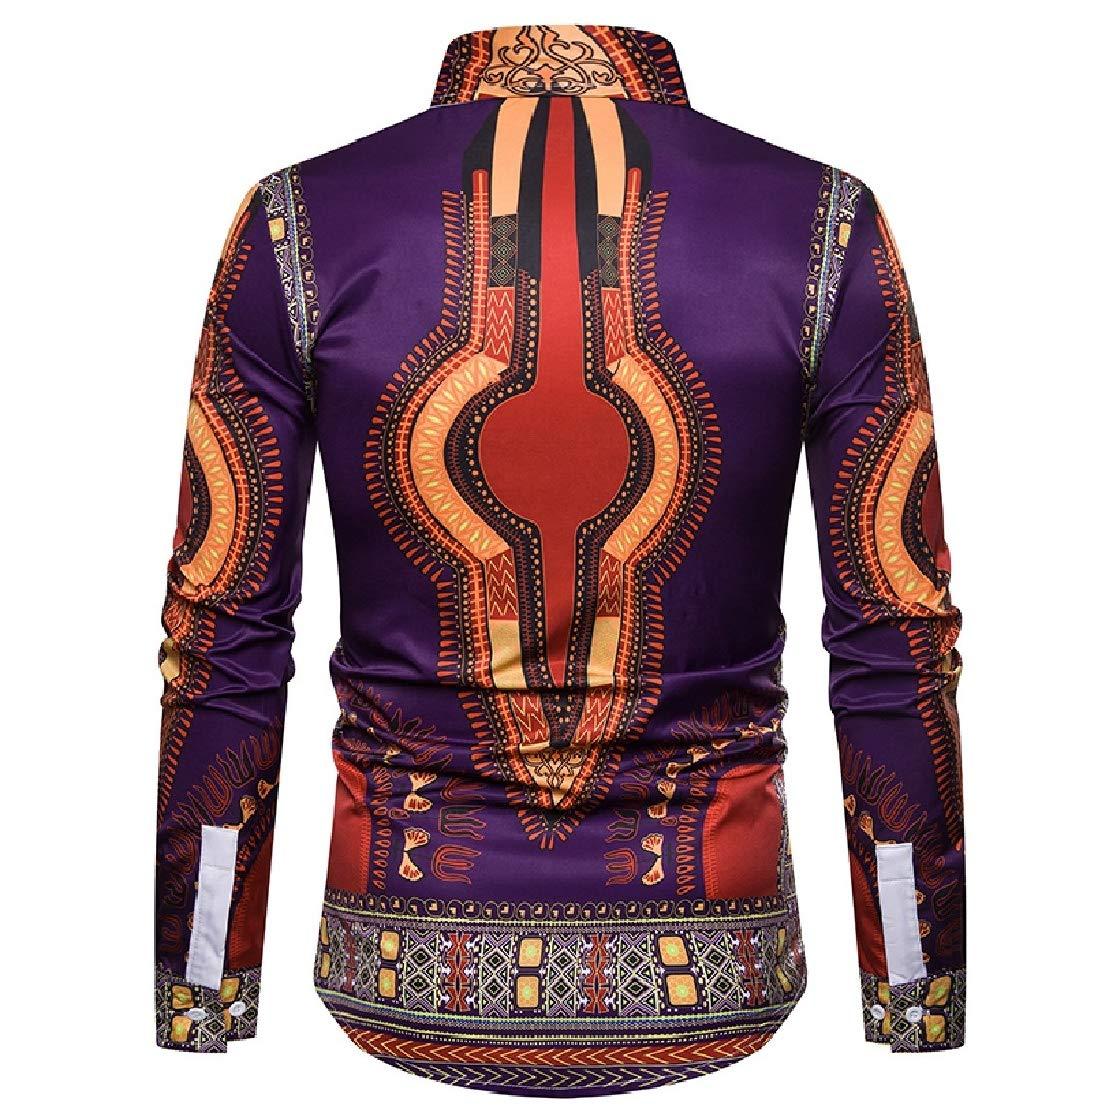 YUNY Mens African Dashiki 3D Digital Printed Long-Sleeve Western Shirt Purple XL